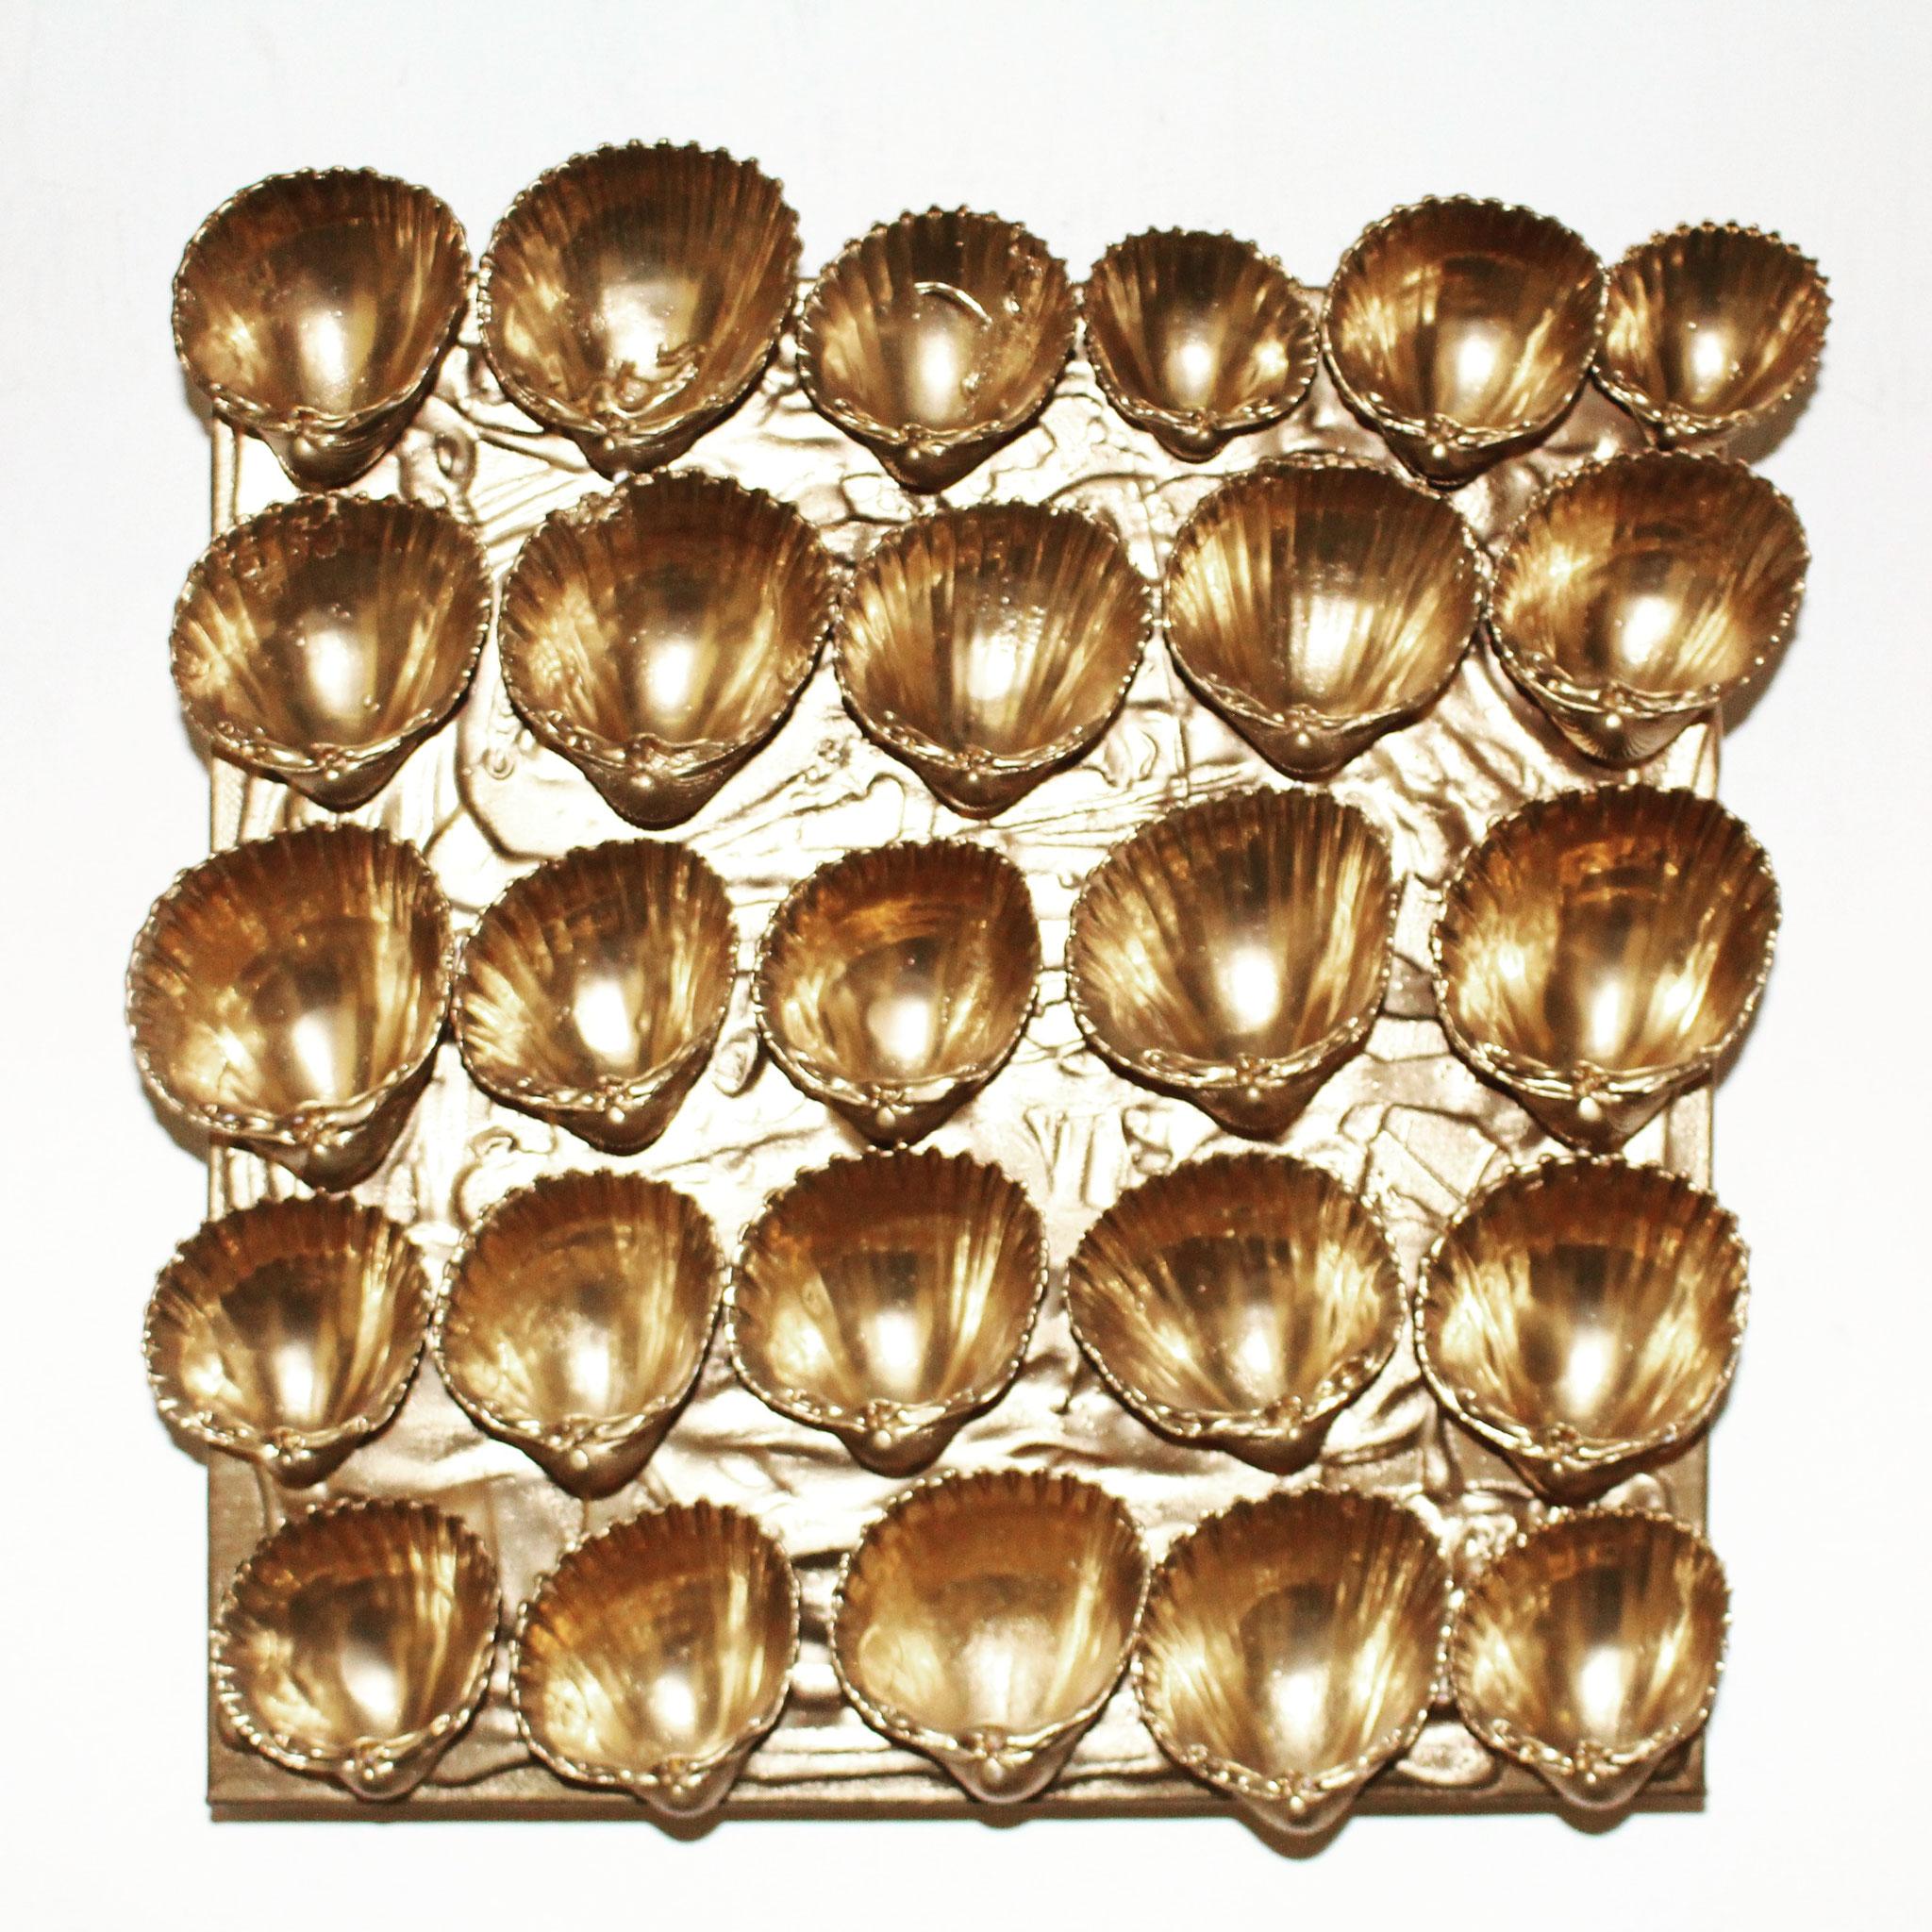 58.'' Golden seeashells.'' (30x30cm) spraypaint       (€560)